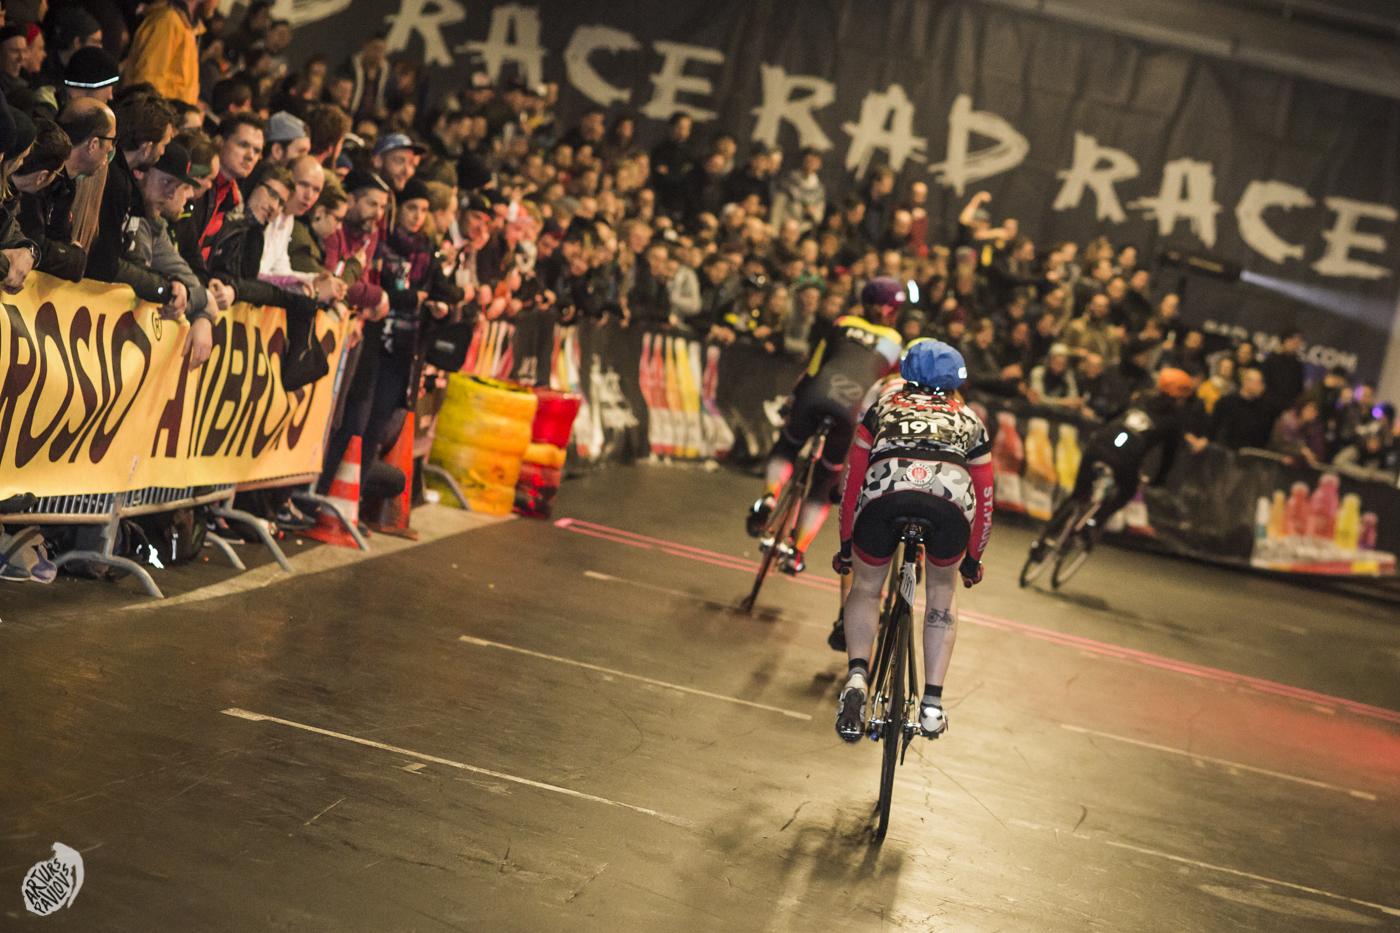 RAD RACE Last Man Standing, Berlin March 19 2016 - Shot by Arturs Pavlovs 6.jpg